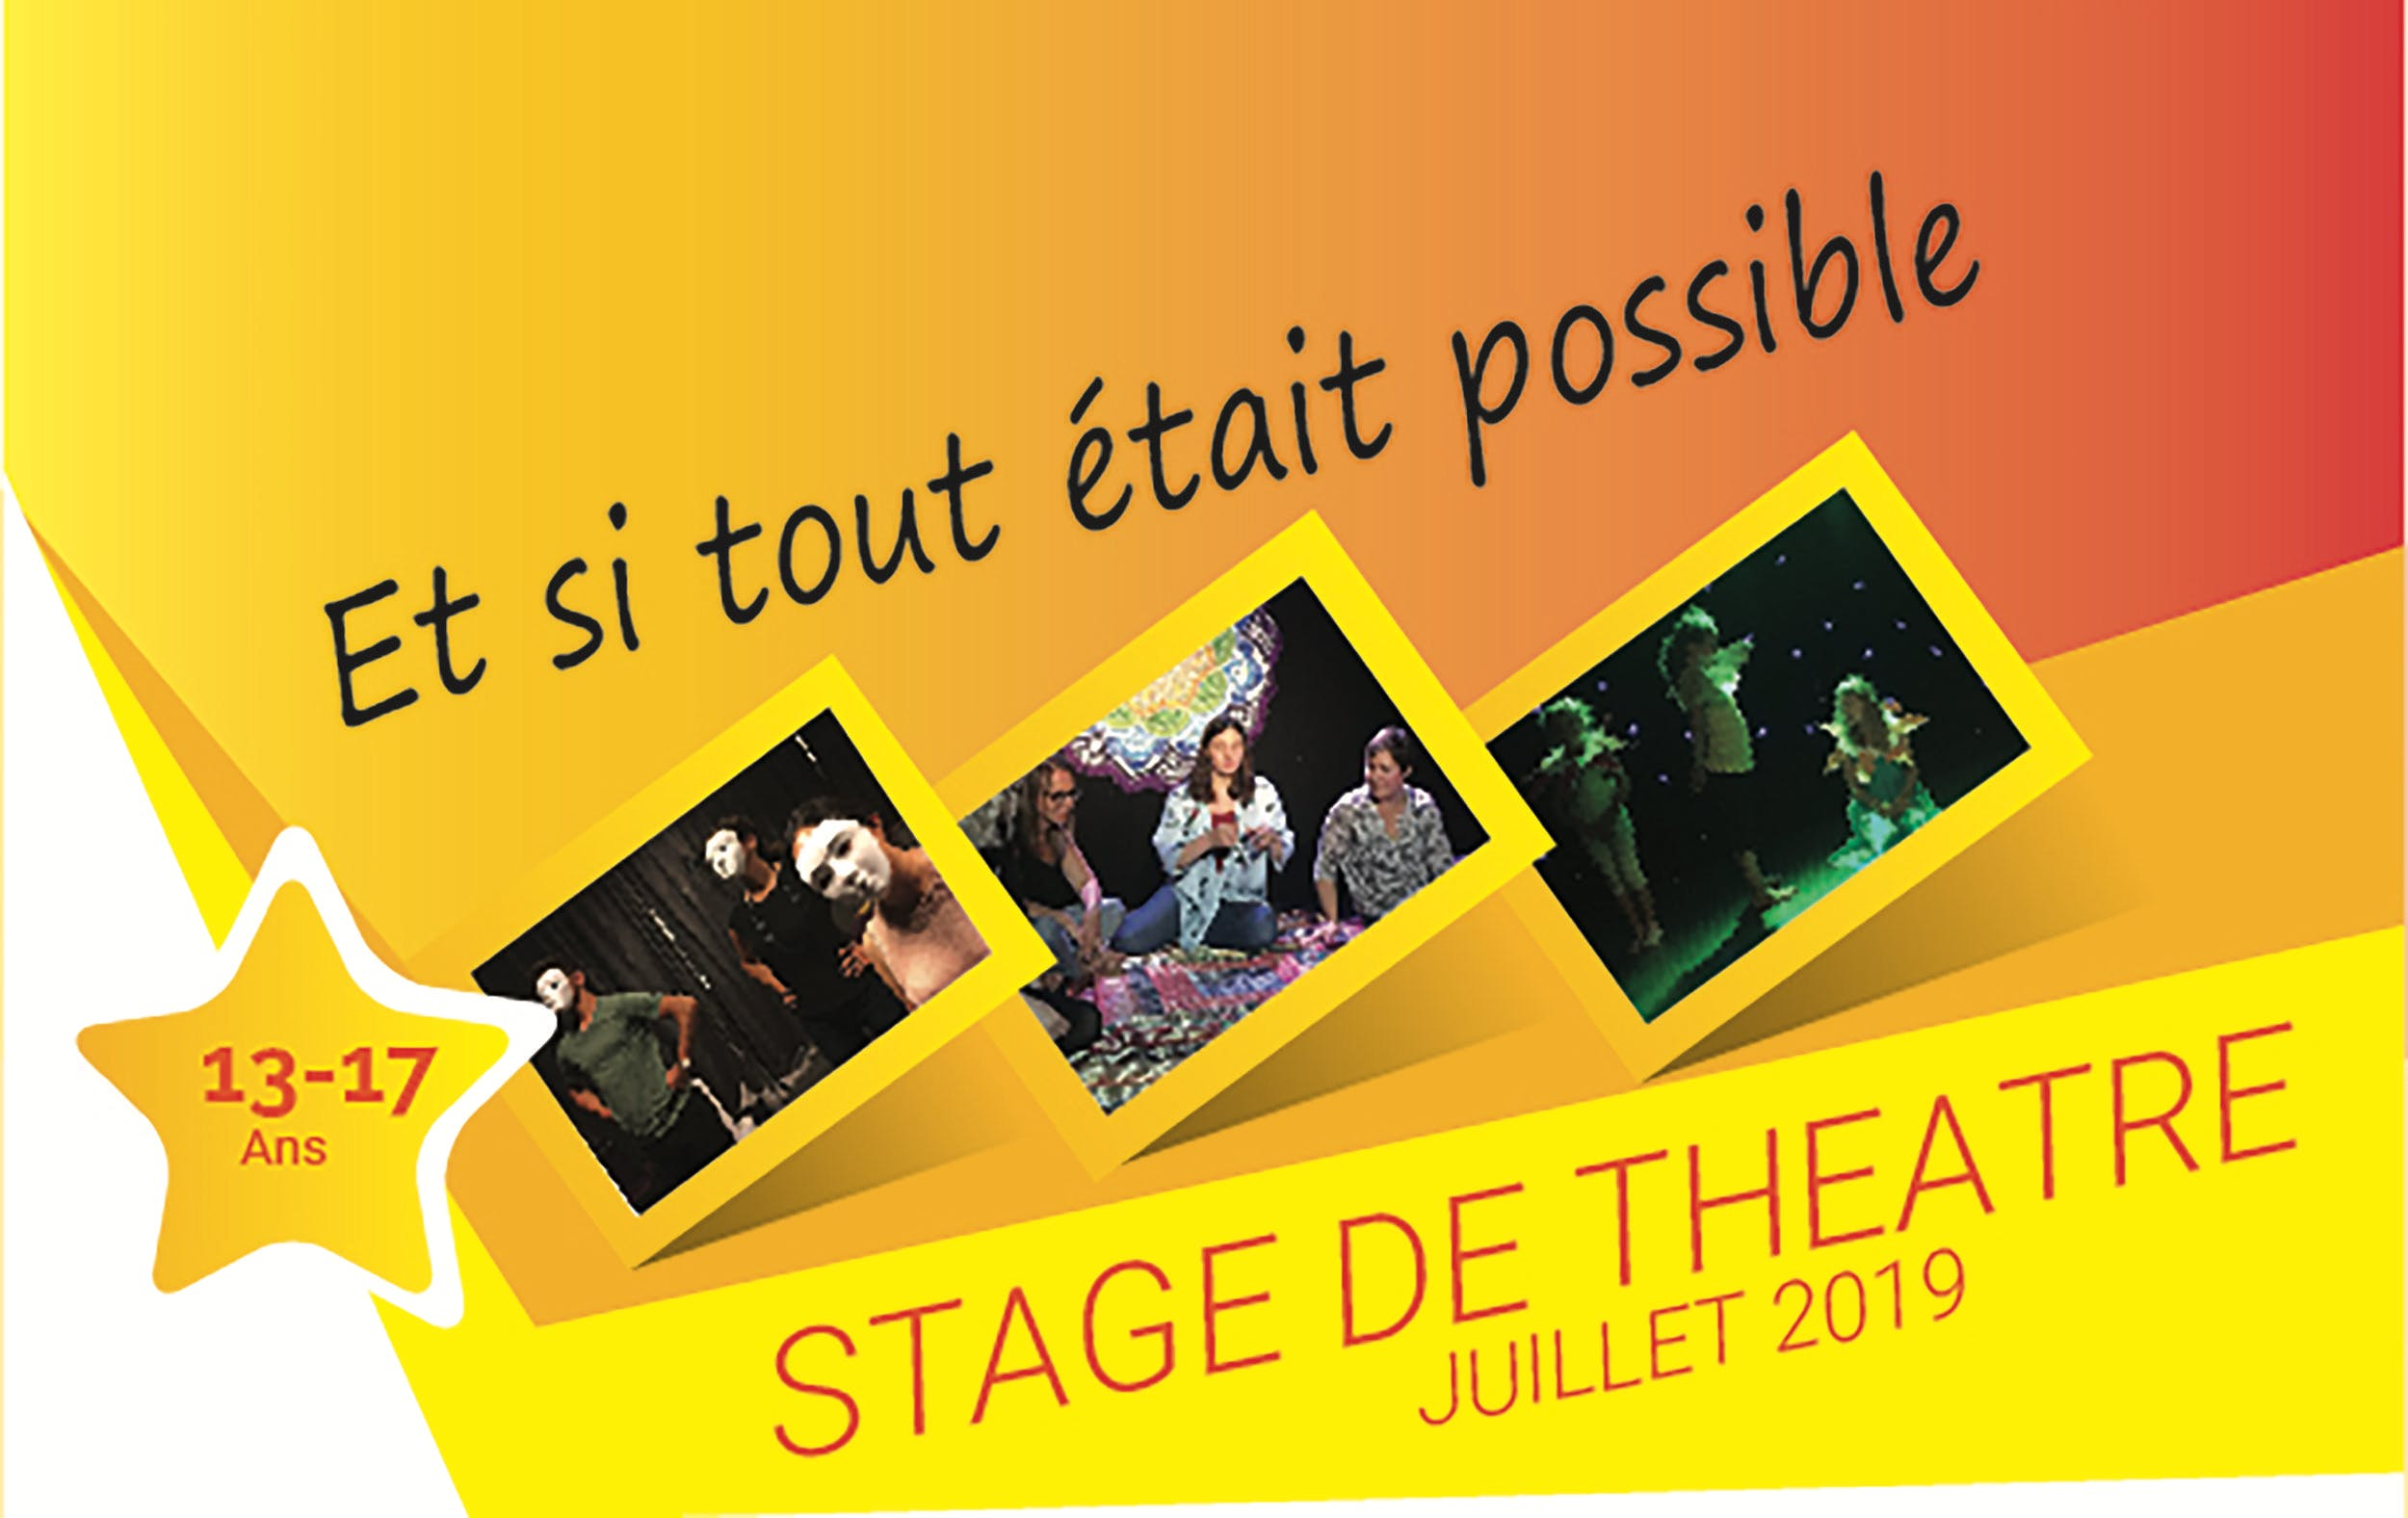 Stage de Théâtre 8-12 juillet 2019 Ados